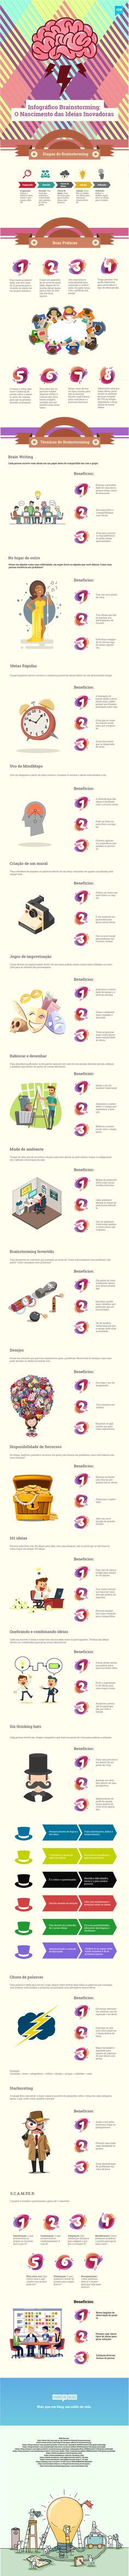 Infografico-Brainstorming-2